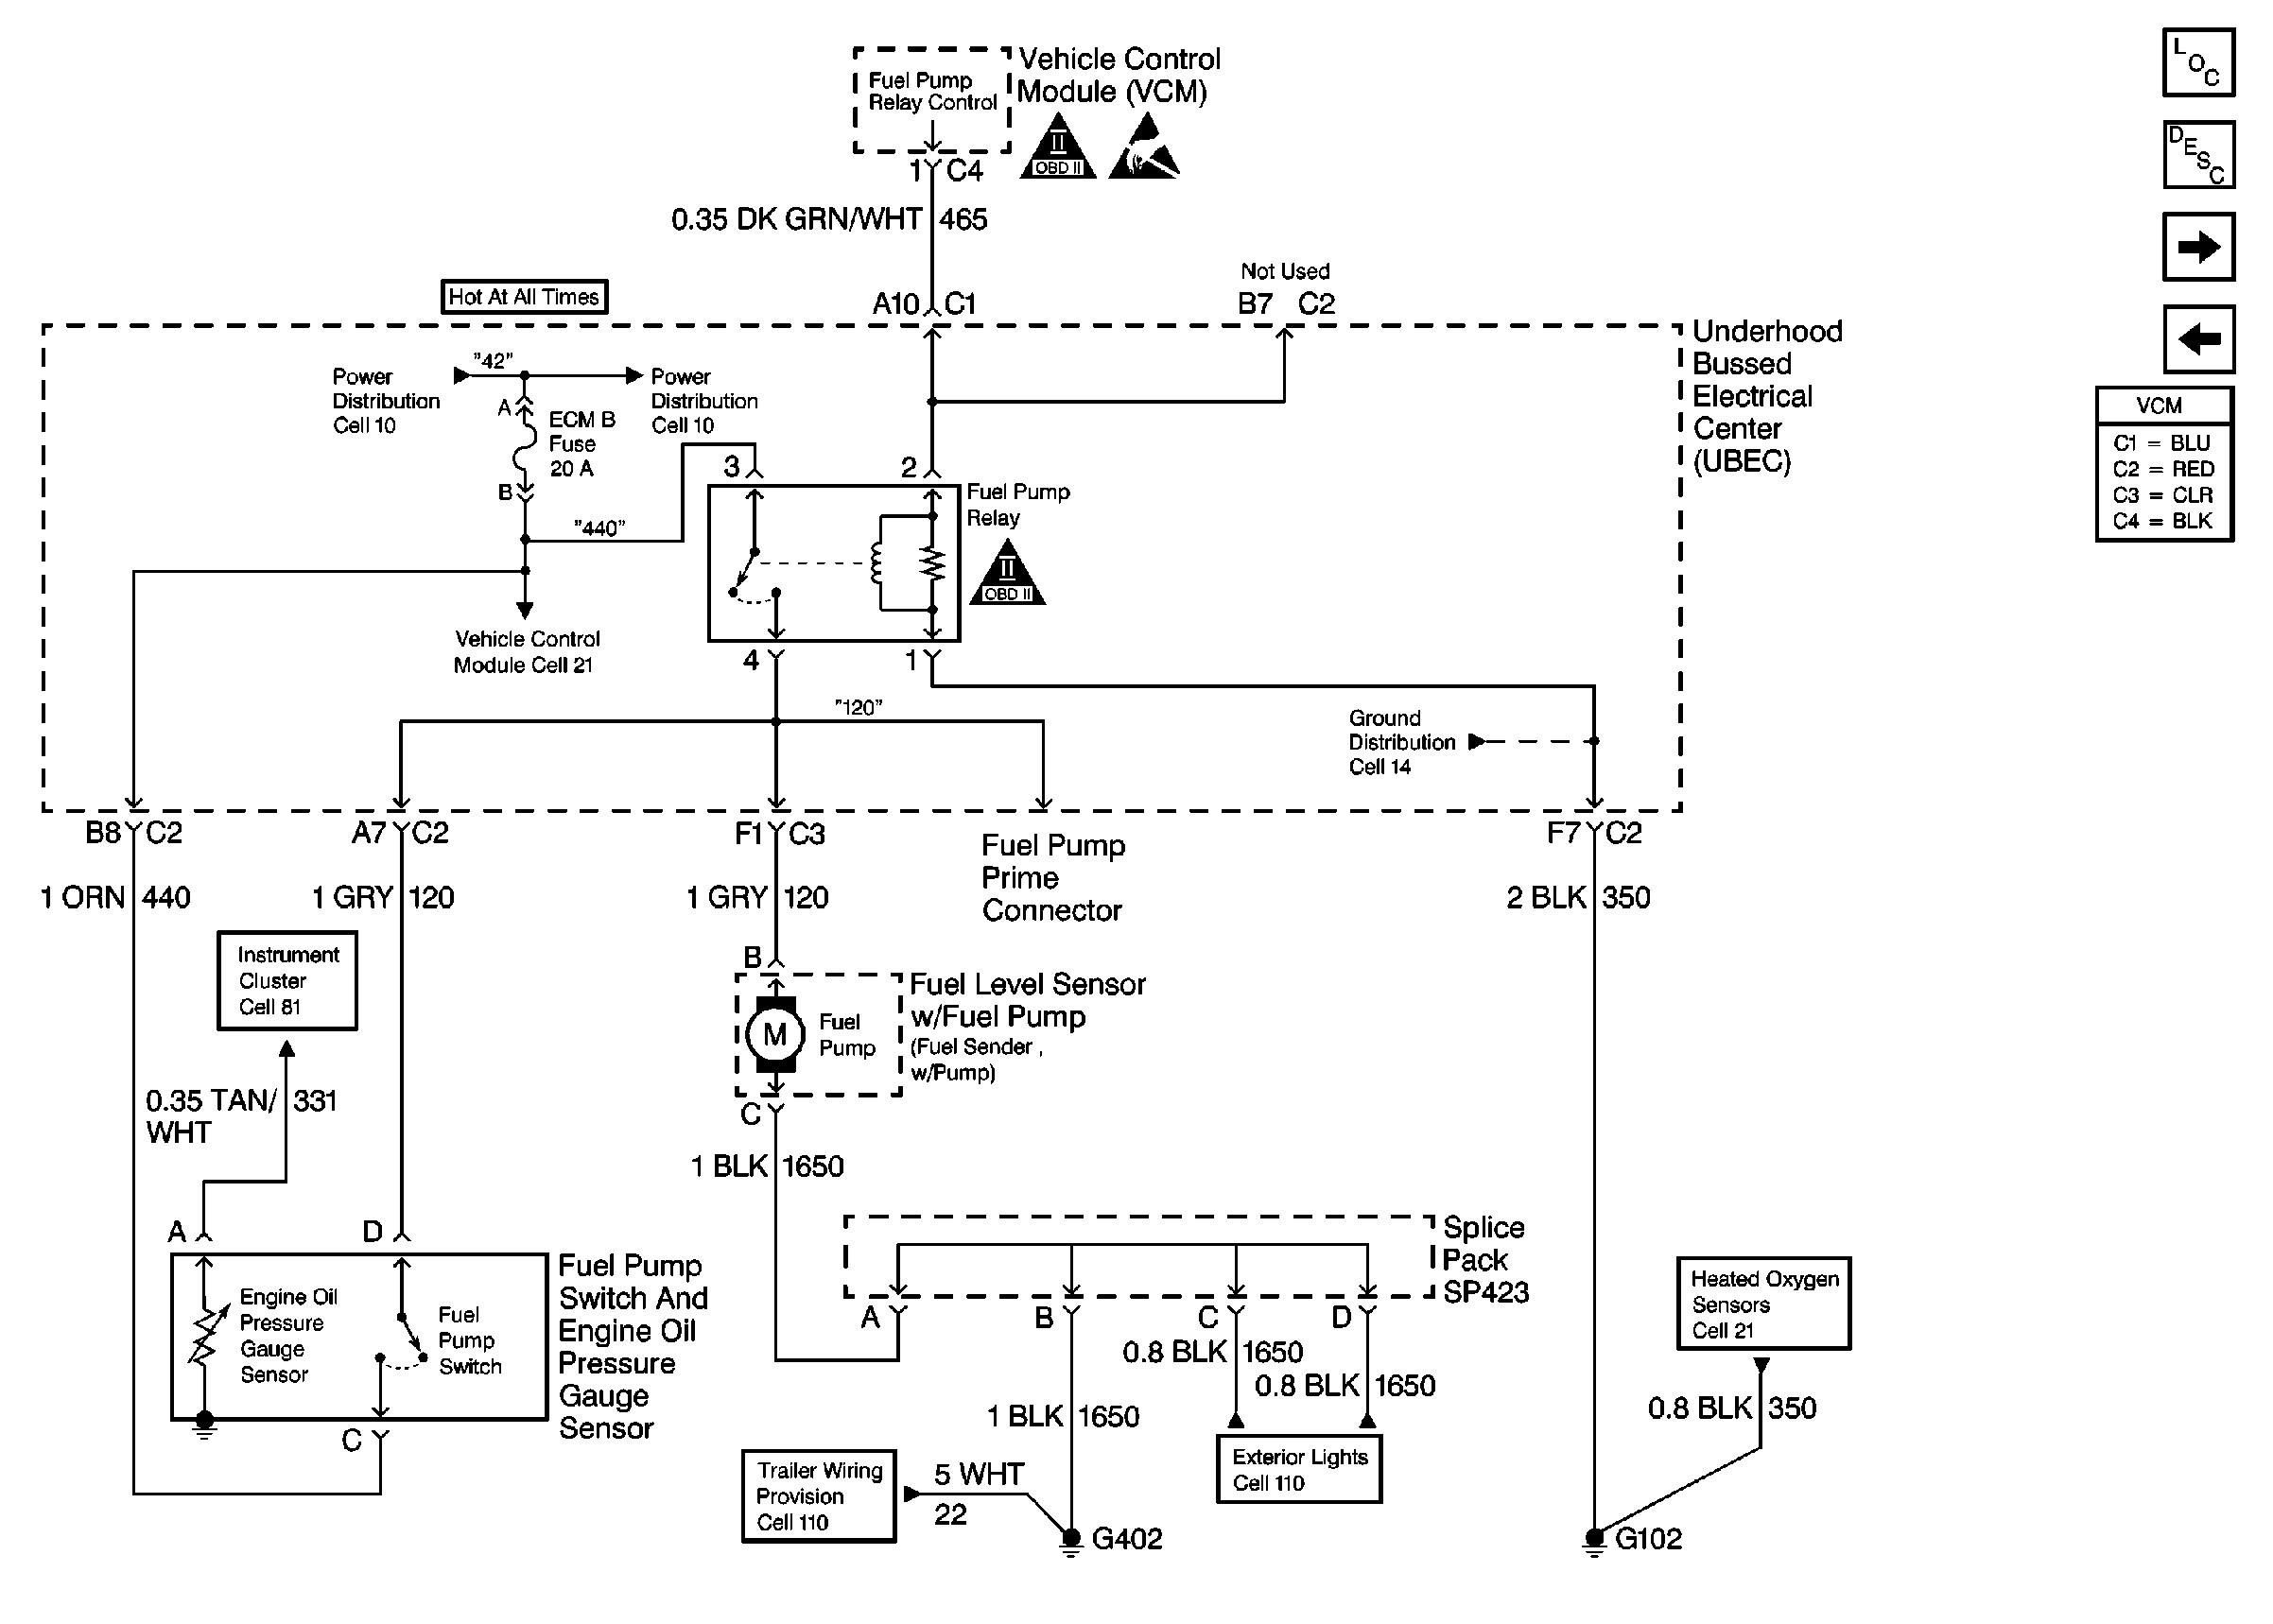 2009 Chevy Malibu Wiring Schematic